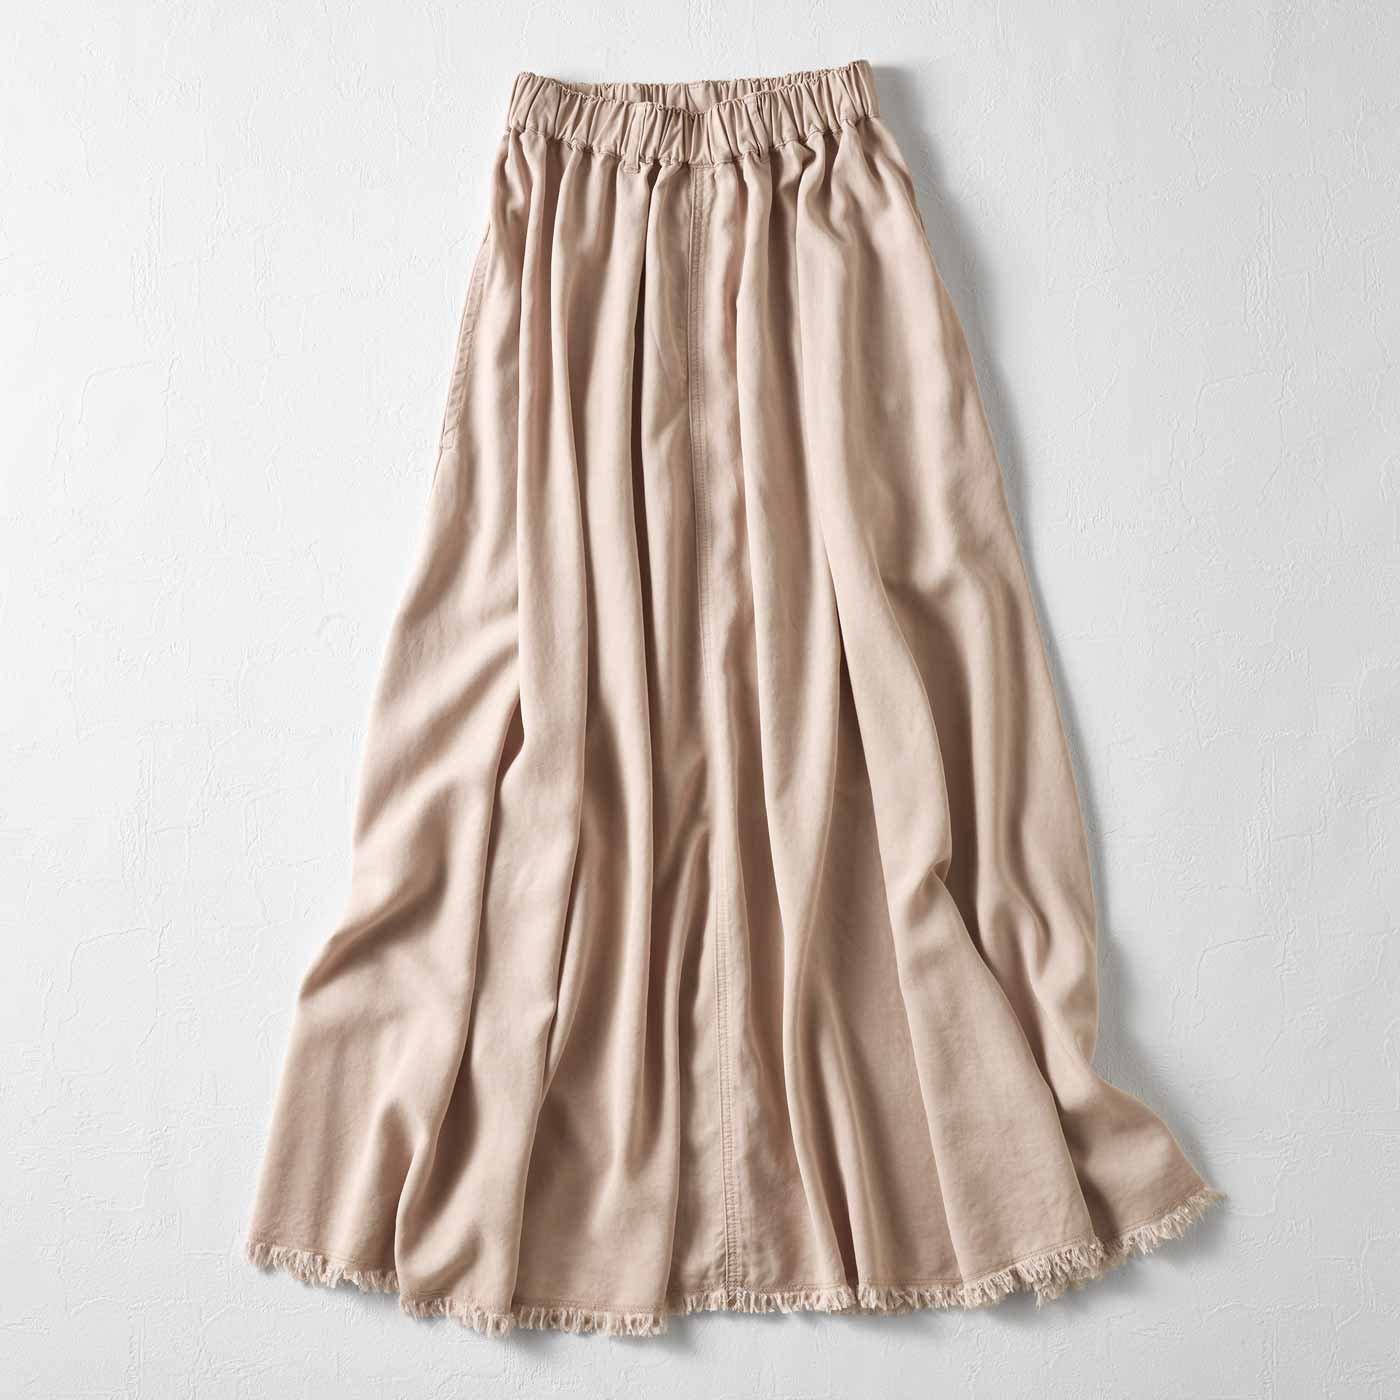 MEDE19F マキシ丈のボリュームスカート〈ピンクベージュ〉